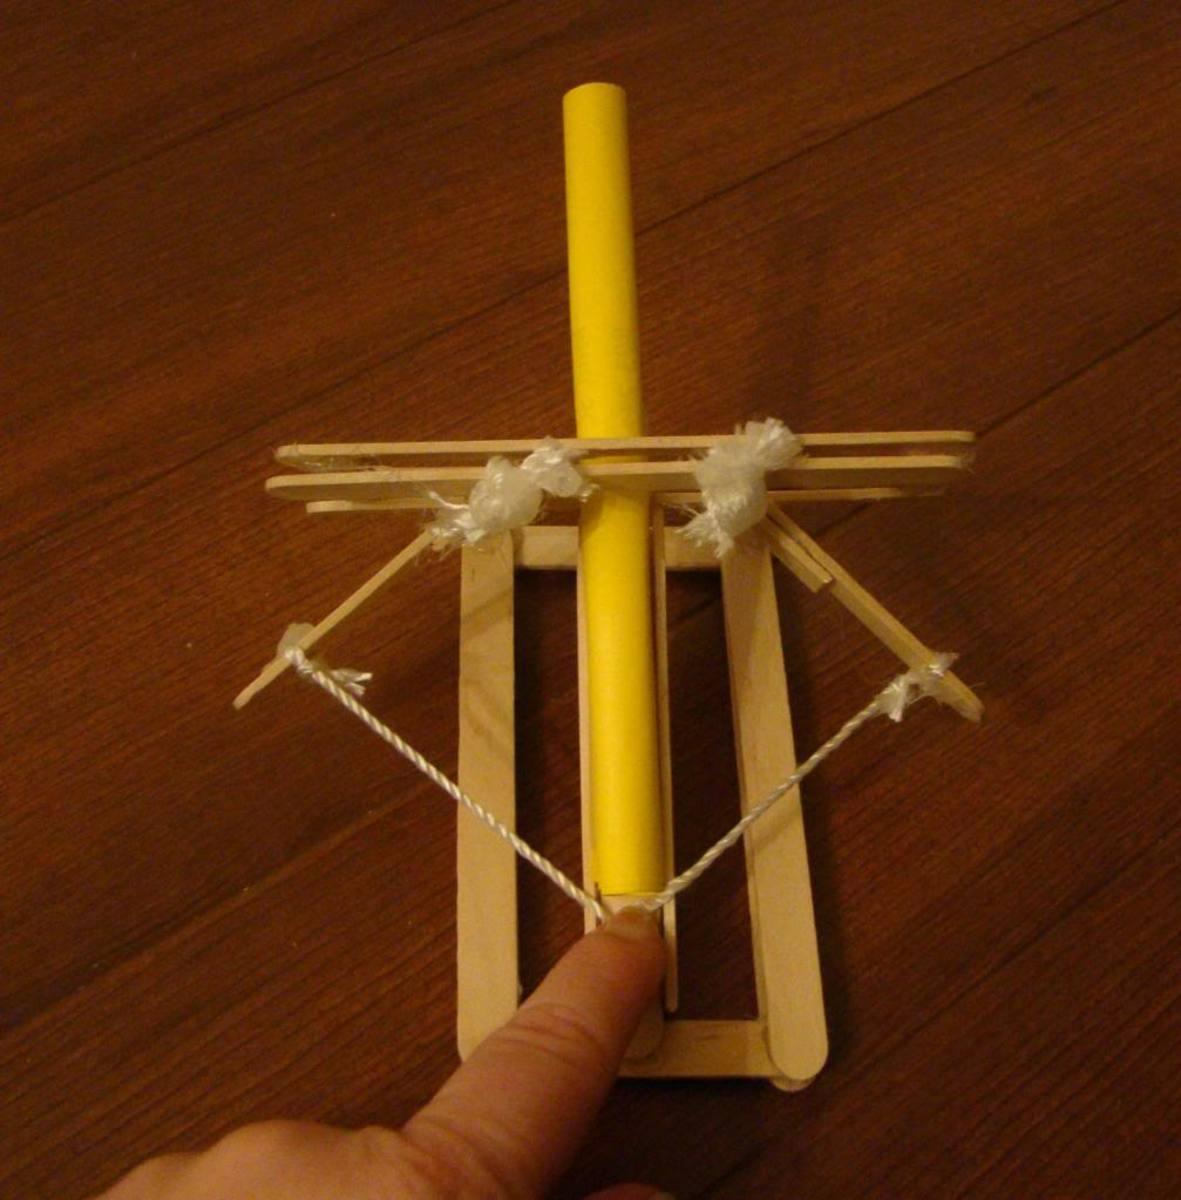 Homemade Ballista Catapult with homemade paper dart